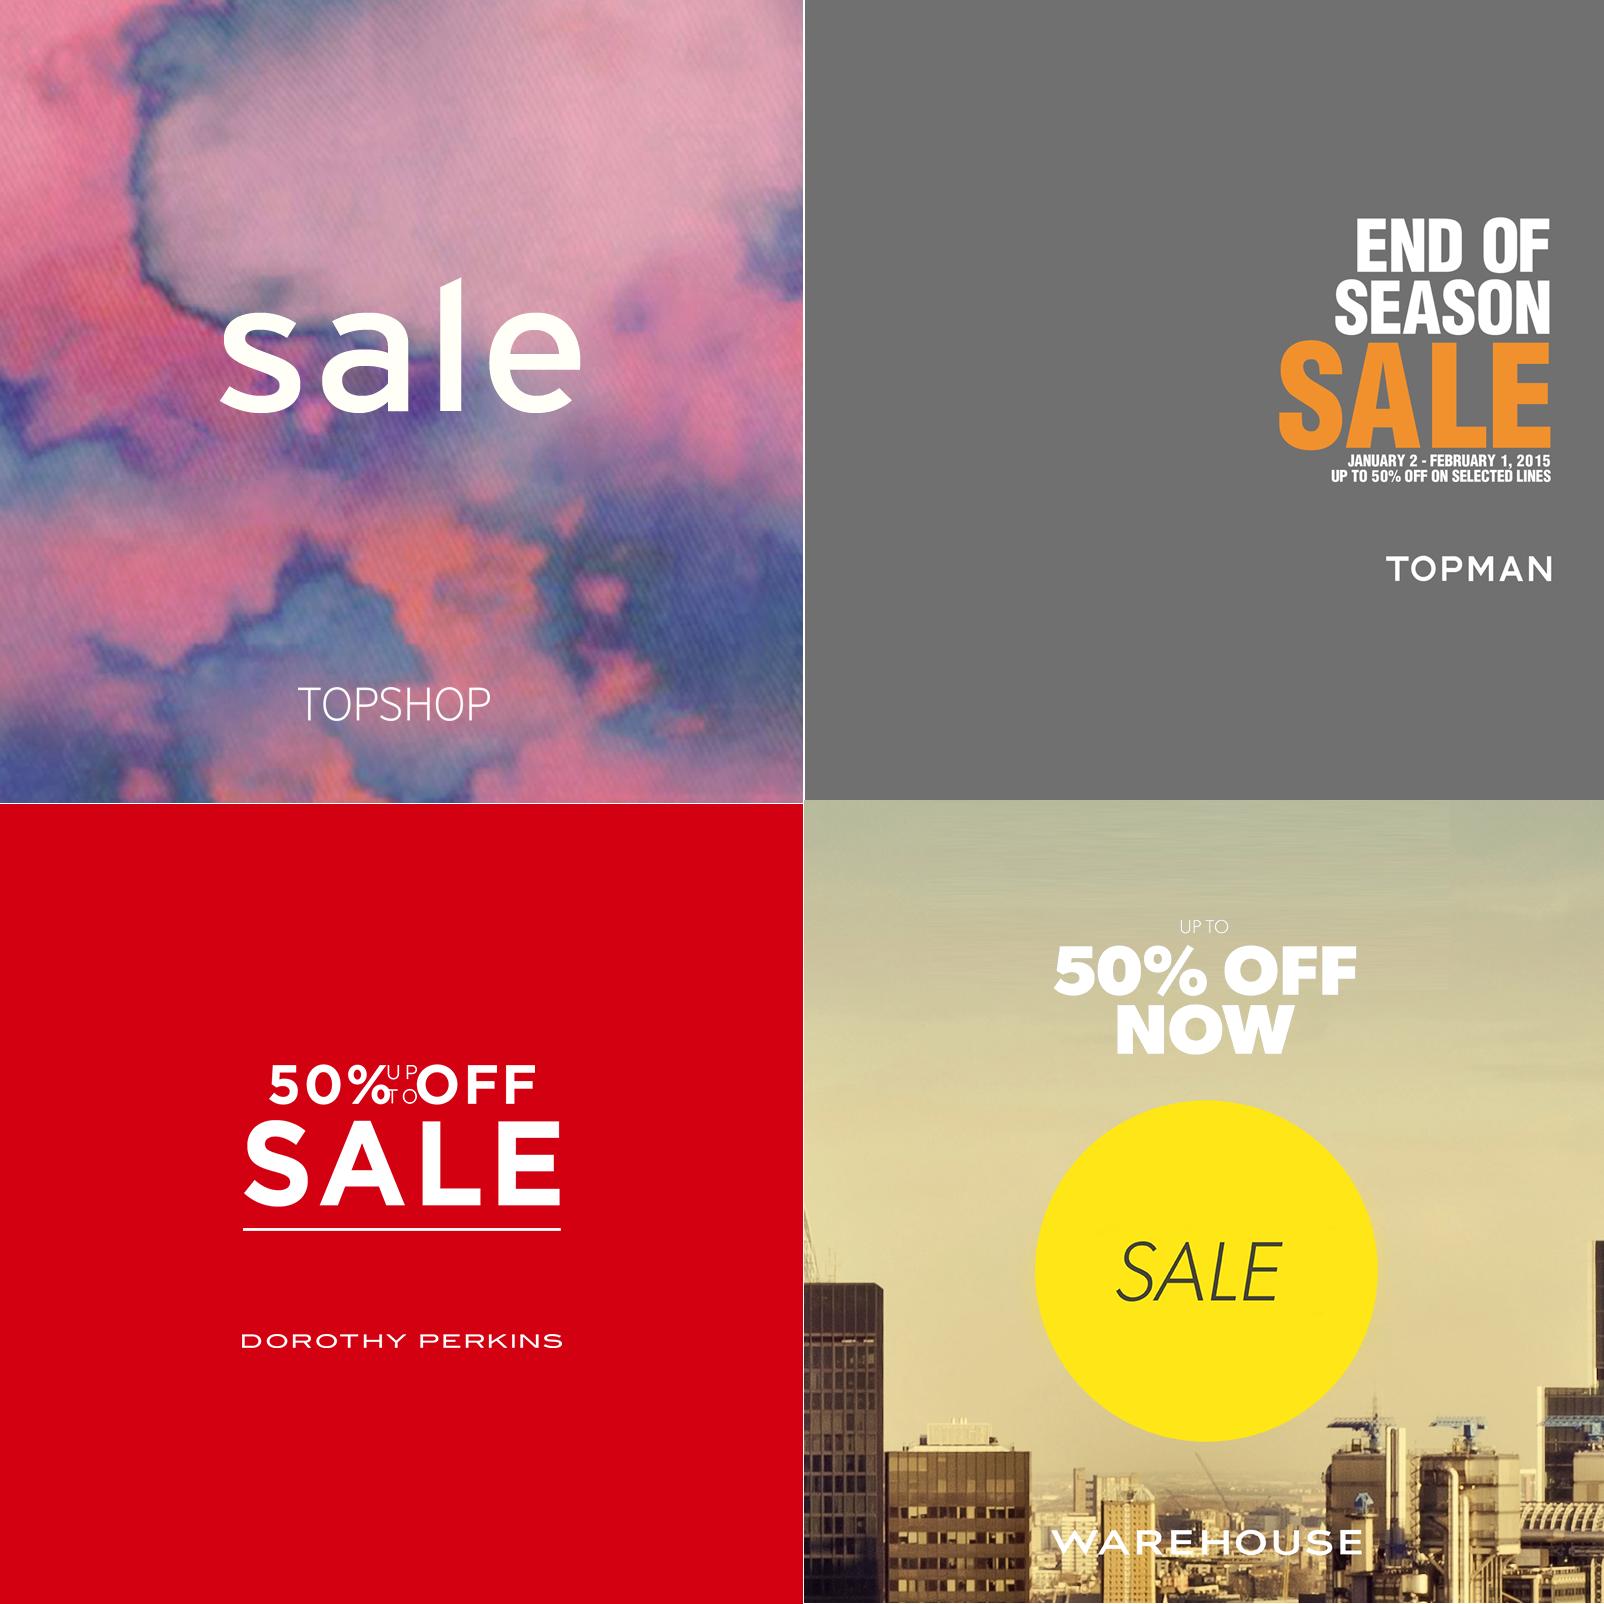 Topshop, Topman, Dorothy Perkins, Warehouse End of Season Sale January - February 2015